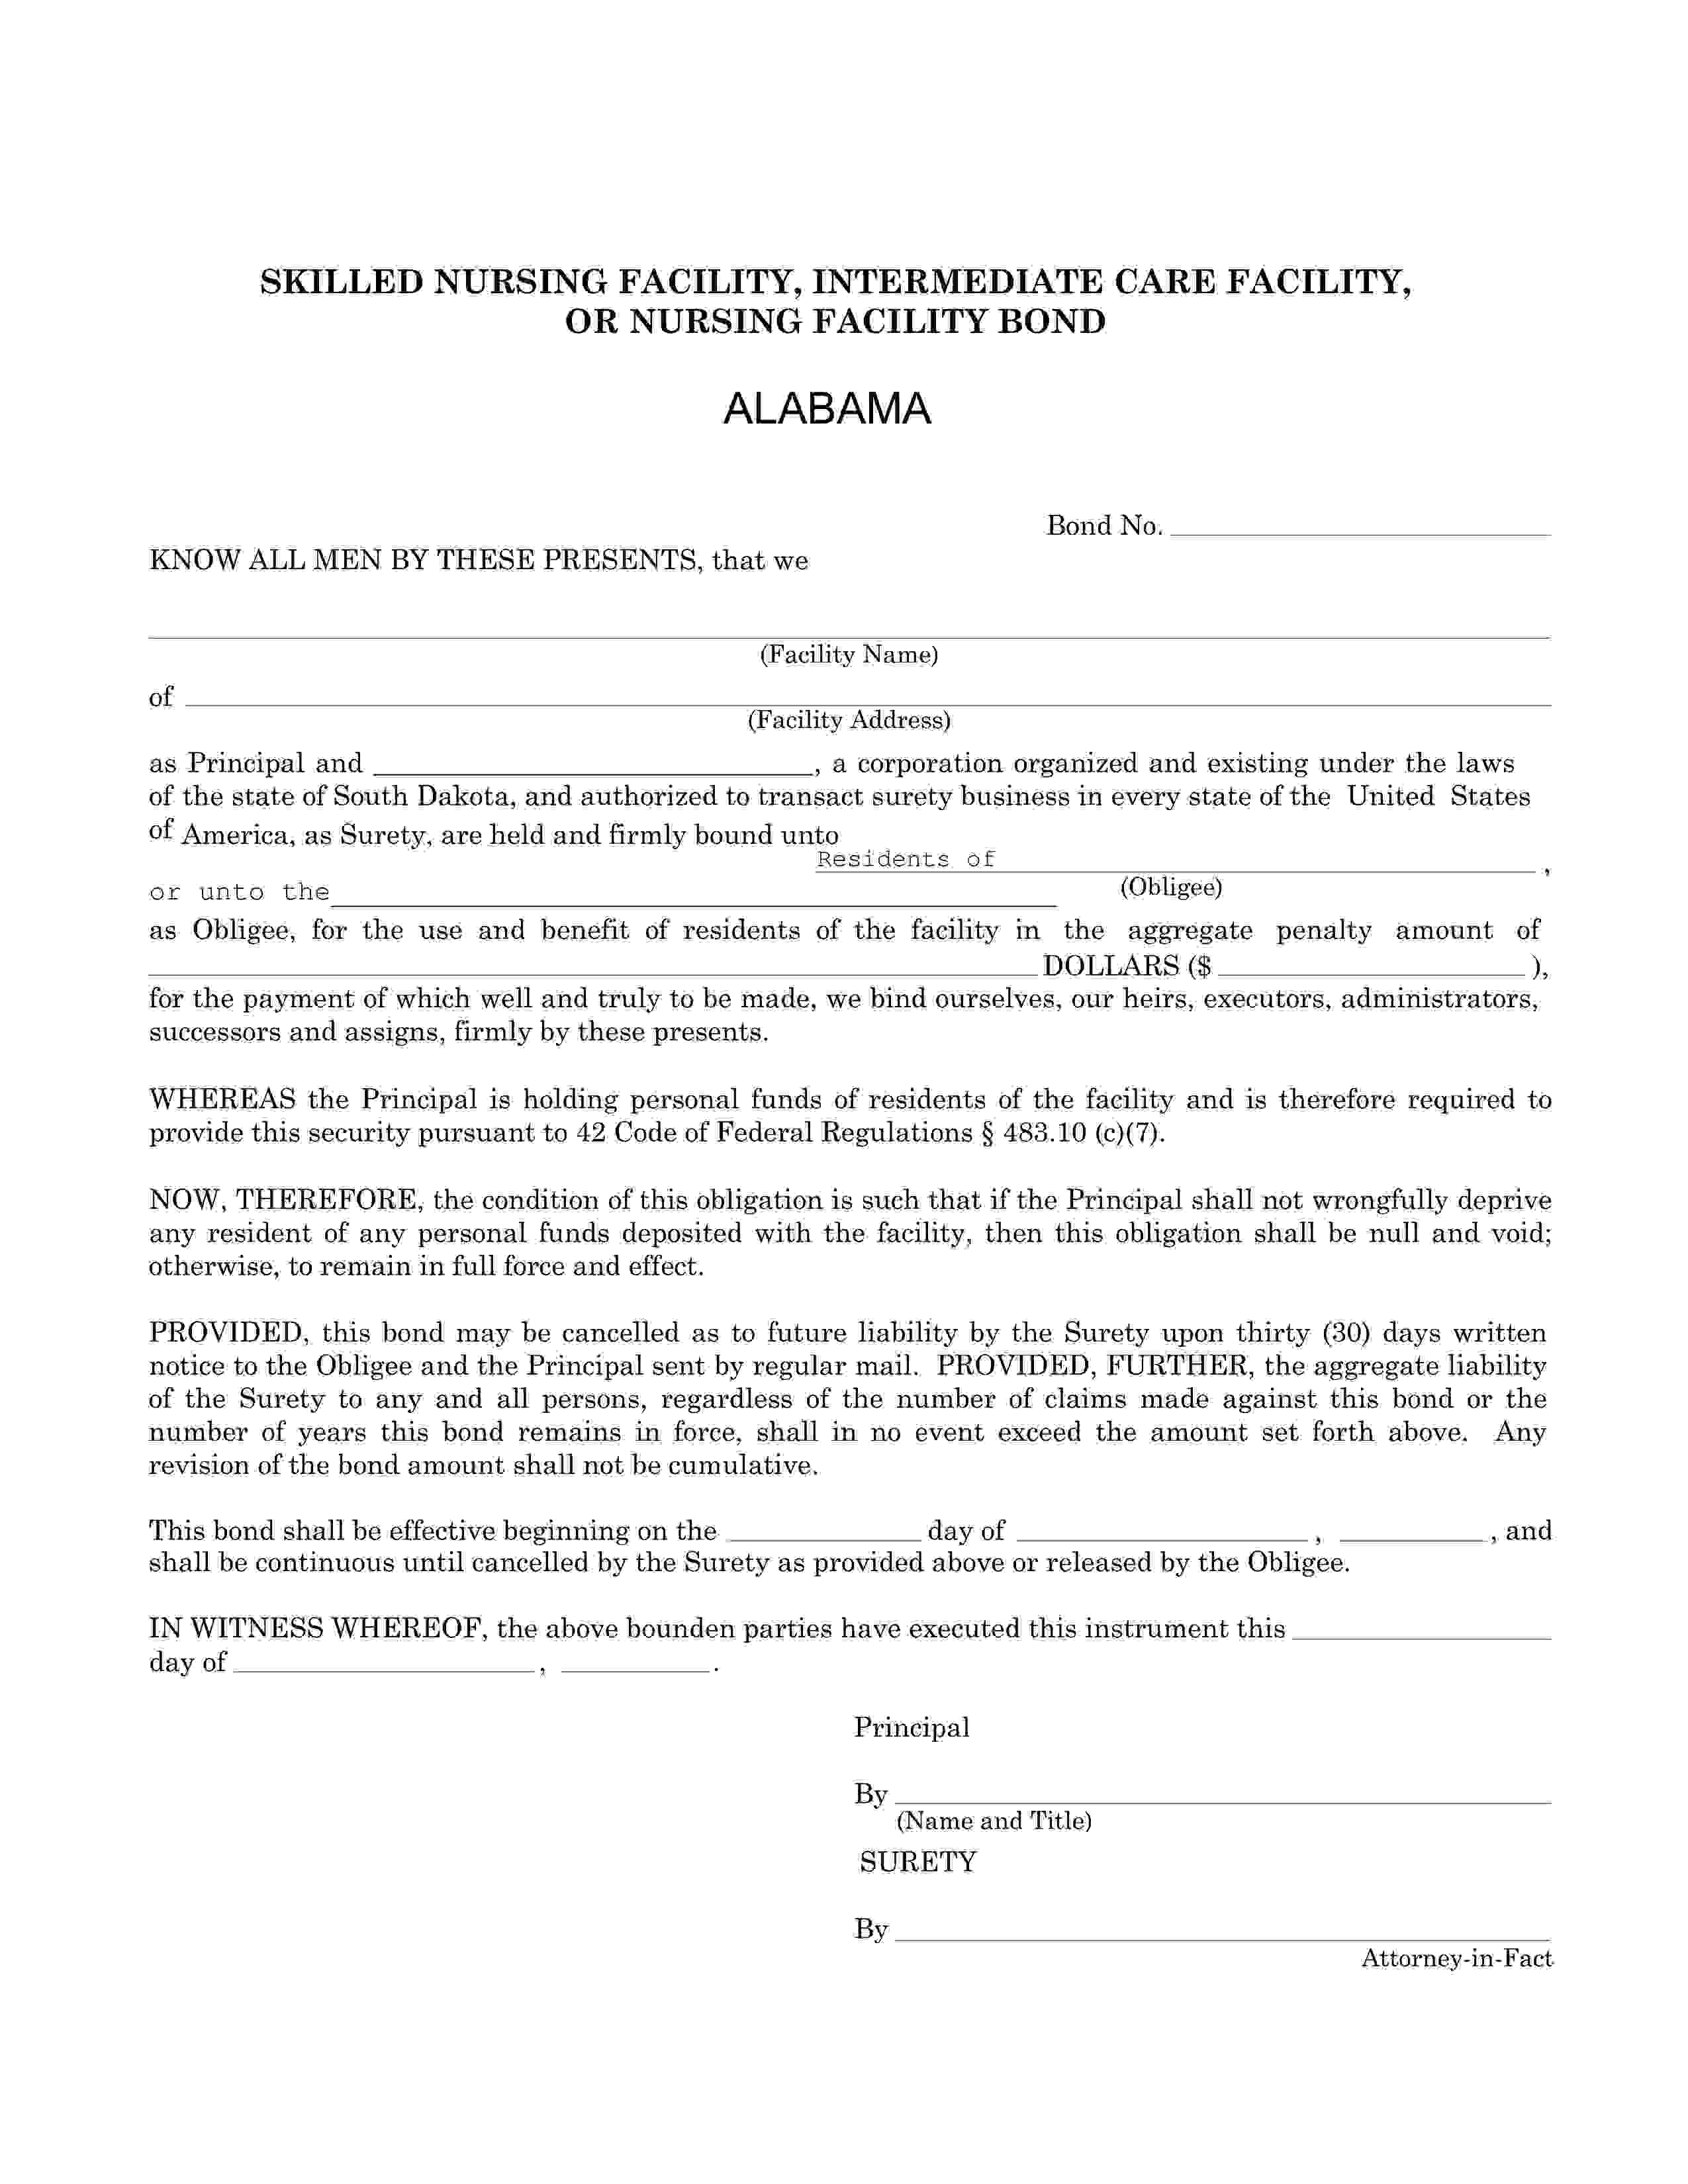 Alabama Dept of Public Health Nursing Facility Resident Trust Fund sample image